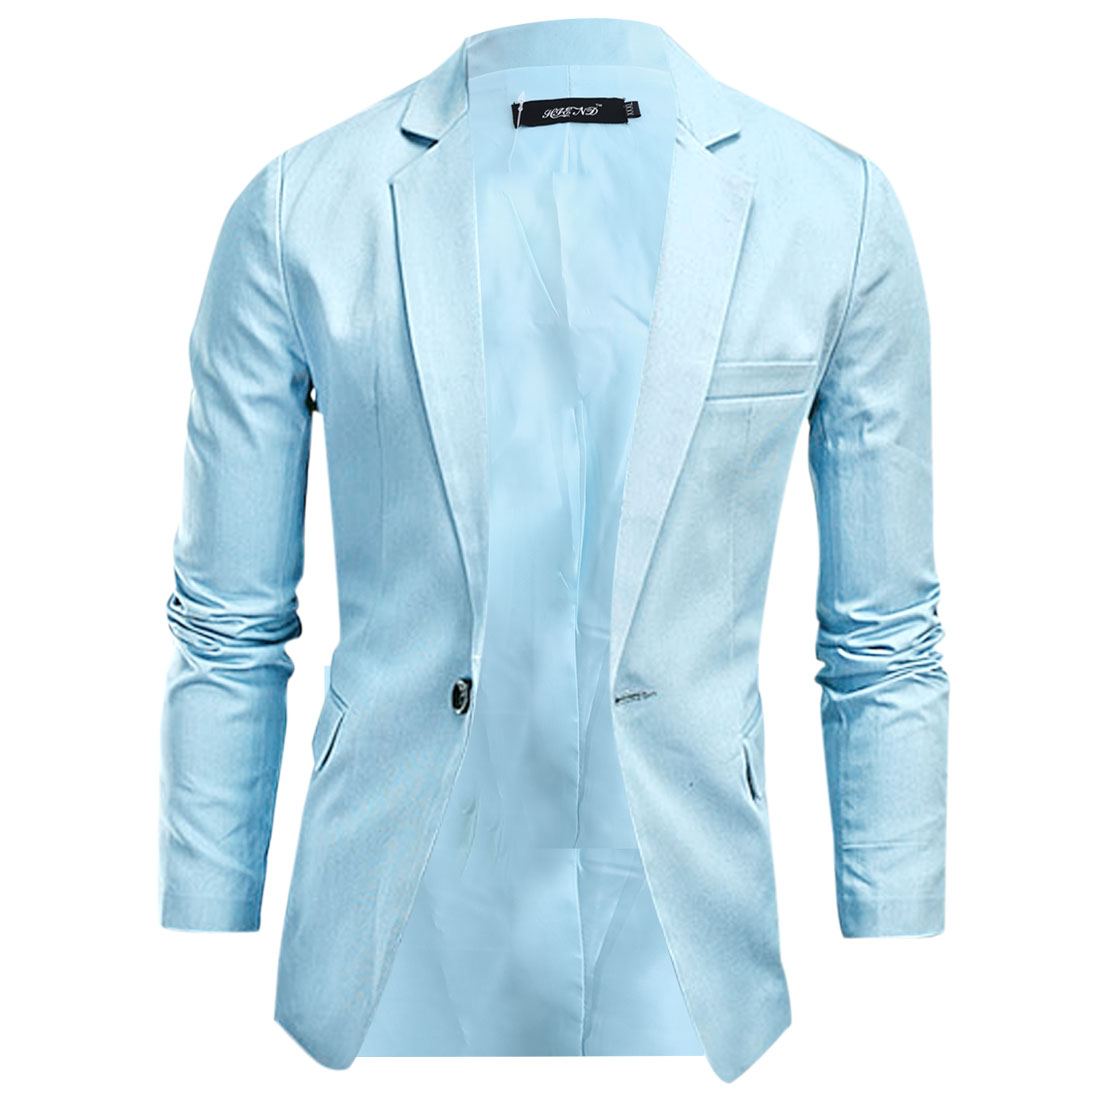 Man Notched Lapel Long Sleeve Padded Shoulder Light Blue Blazer Jacket M